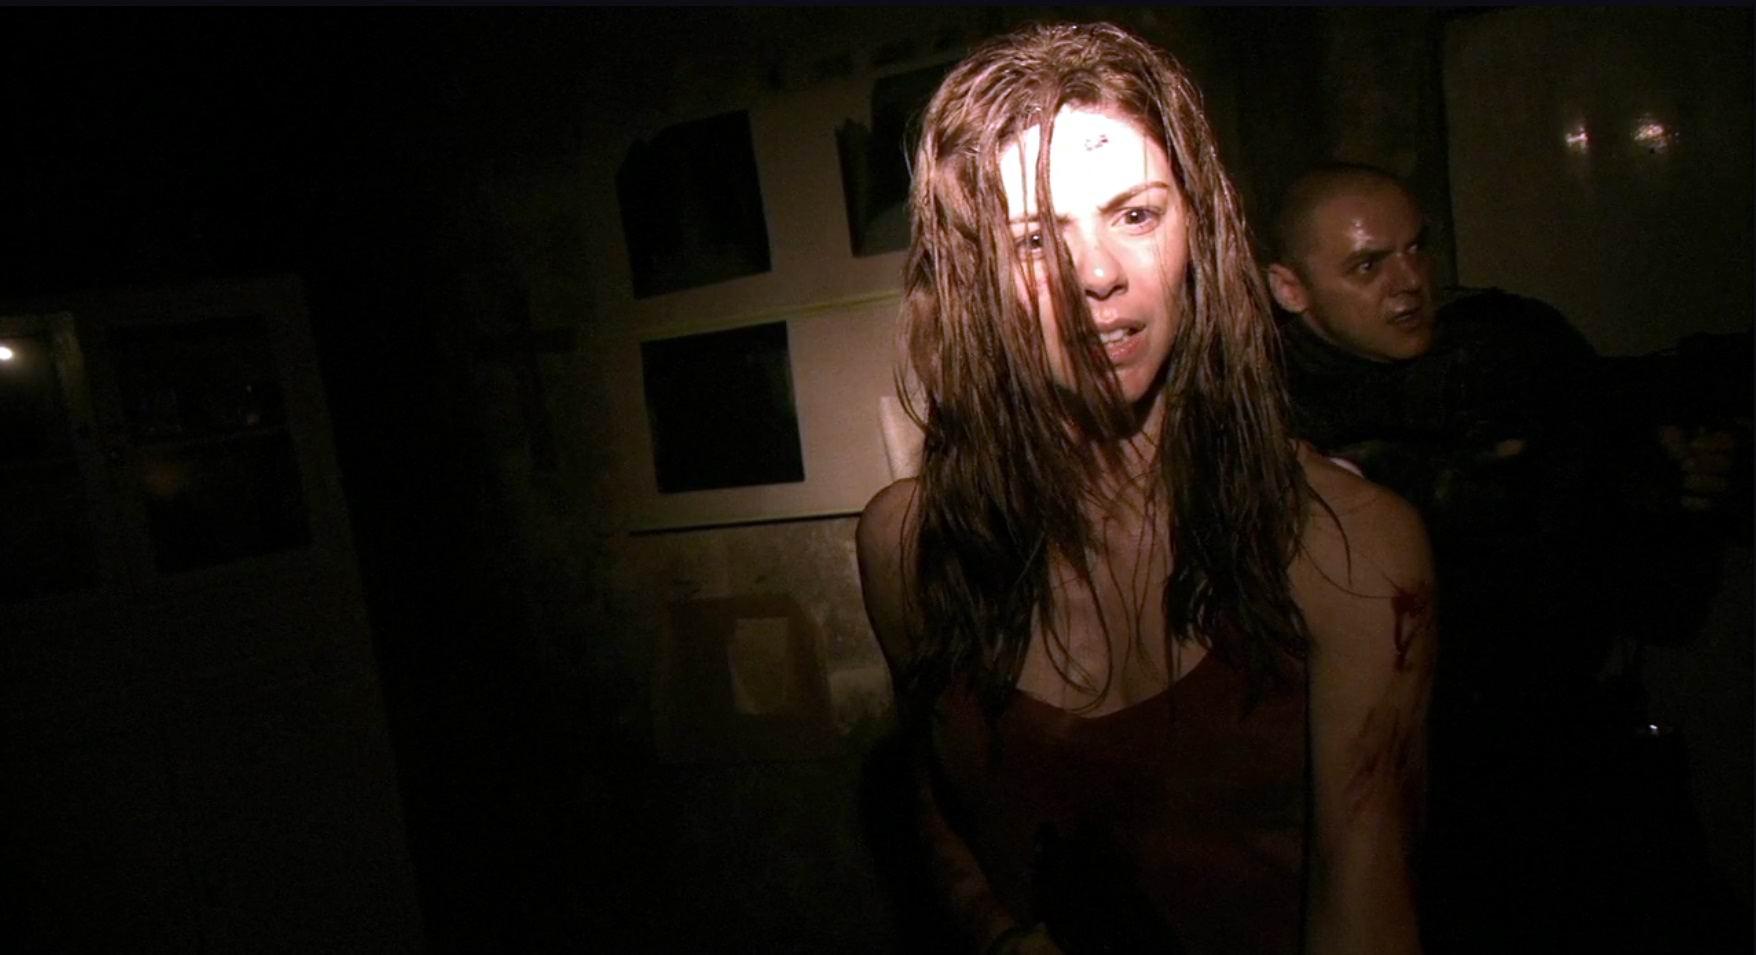 Репортаж / [Rec] (2007): кадр из фильма